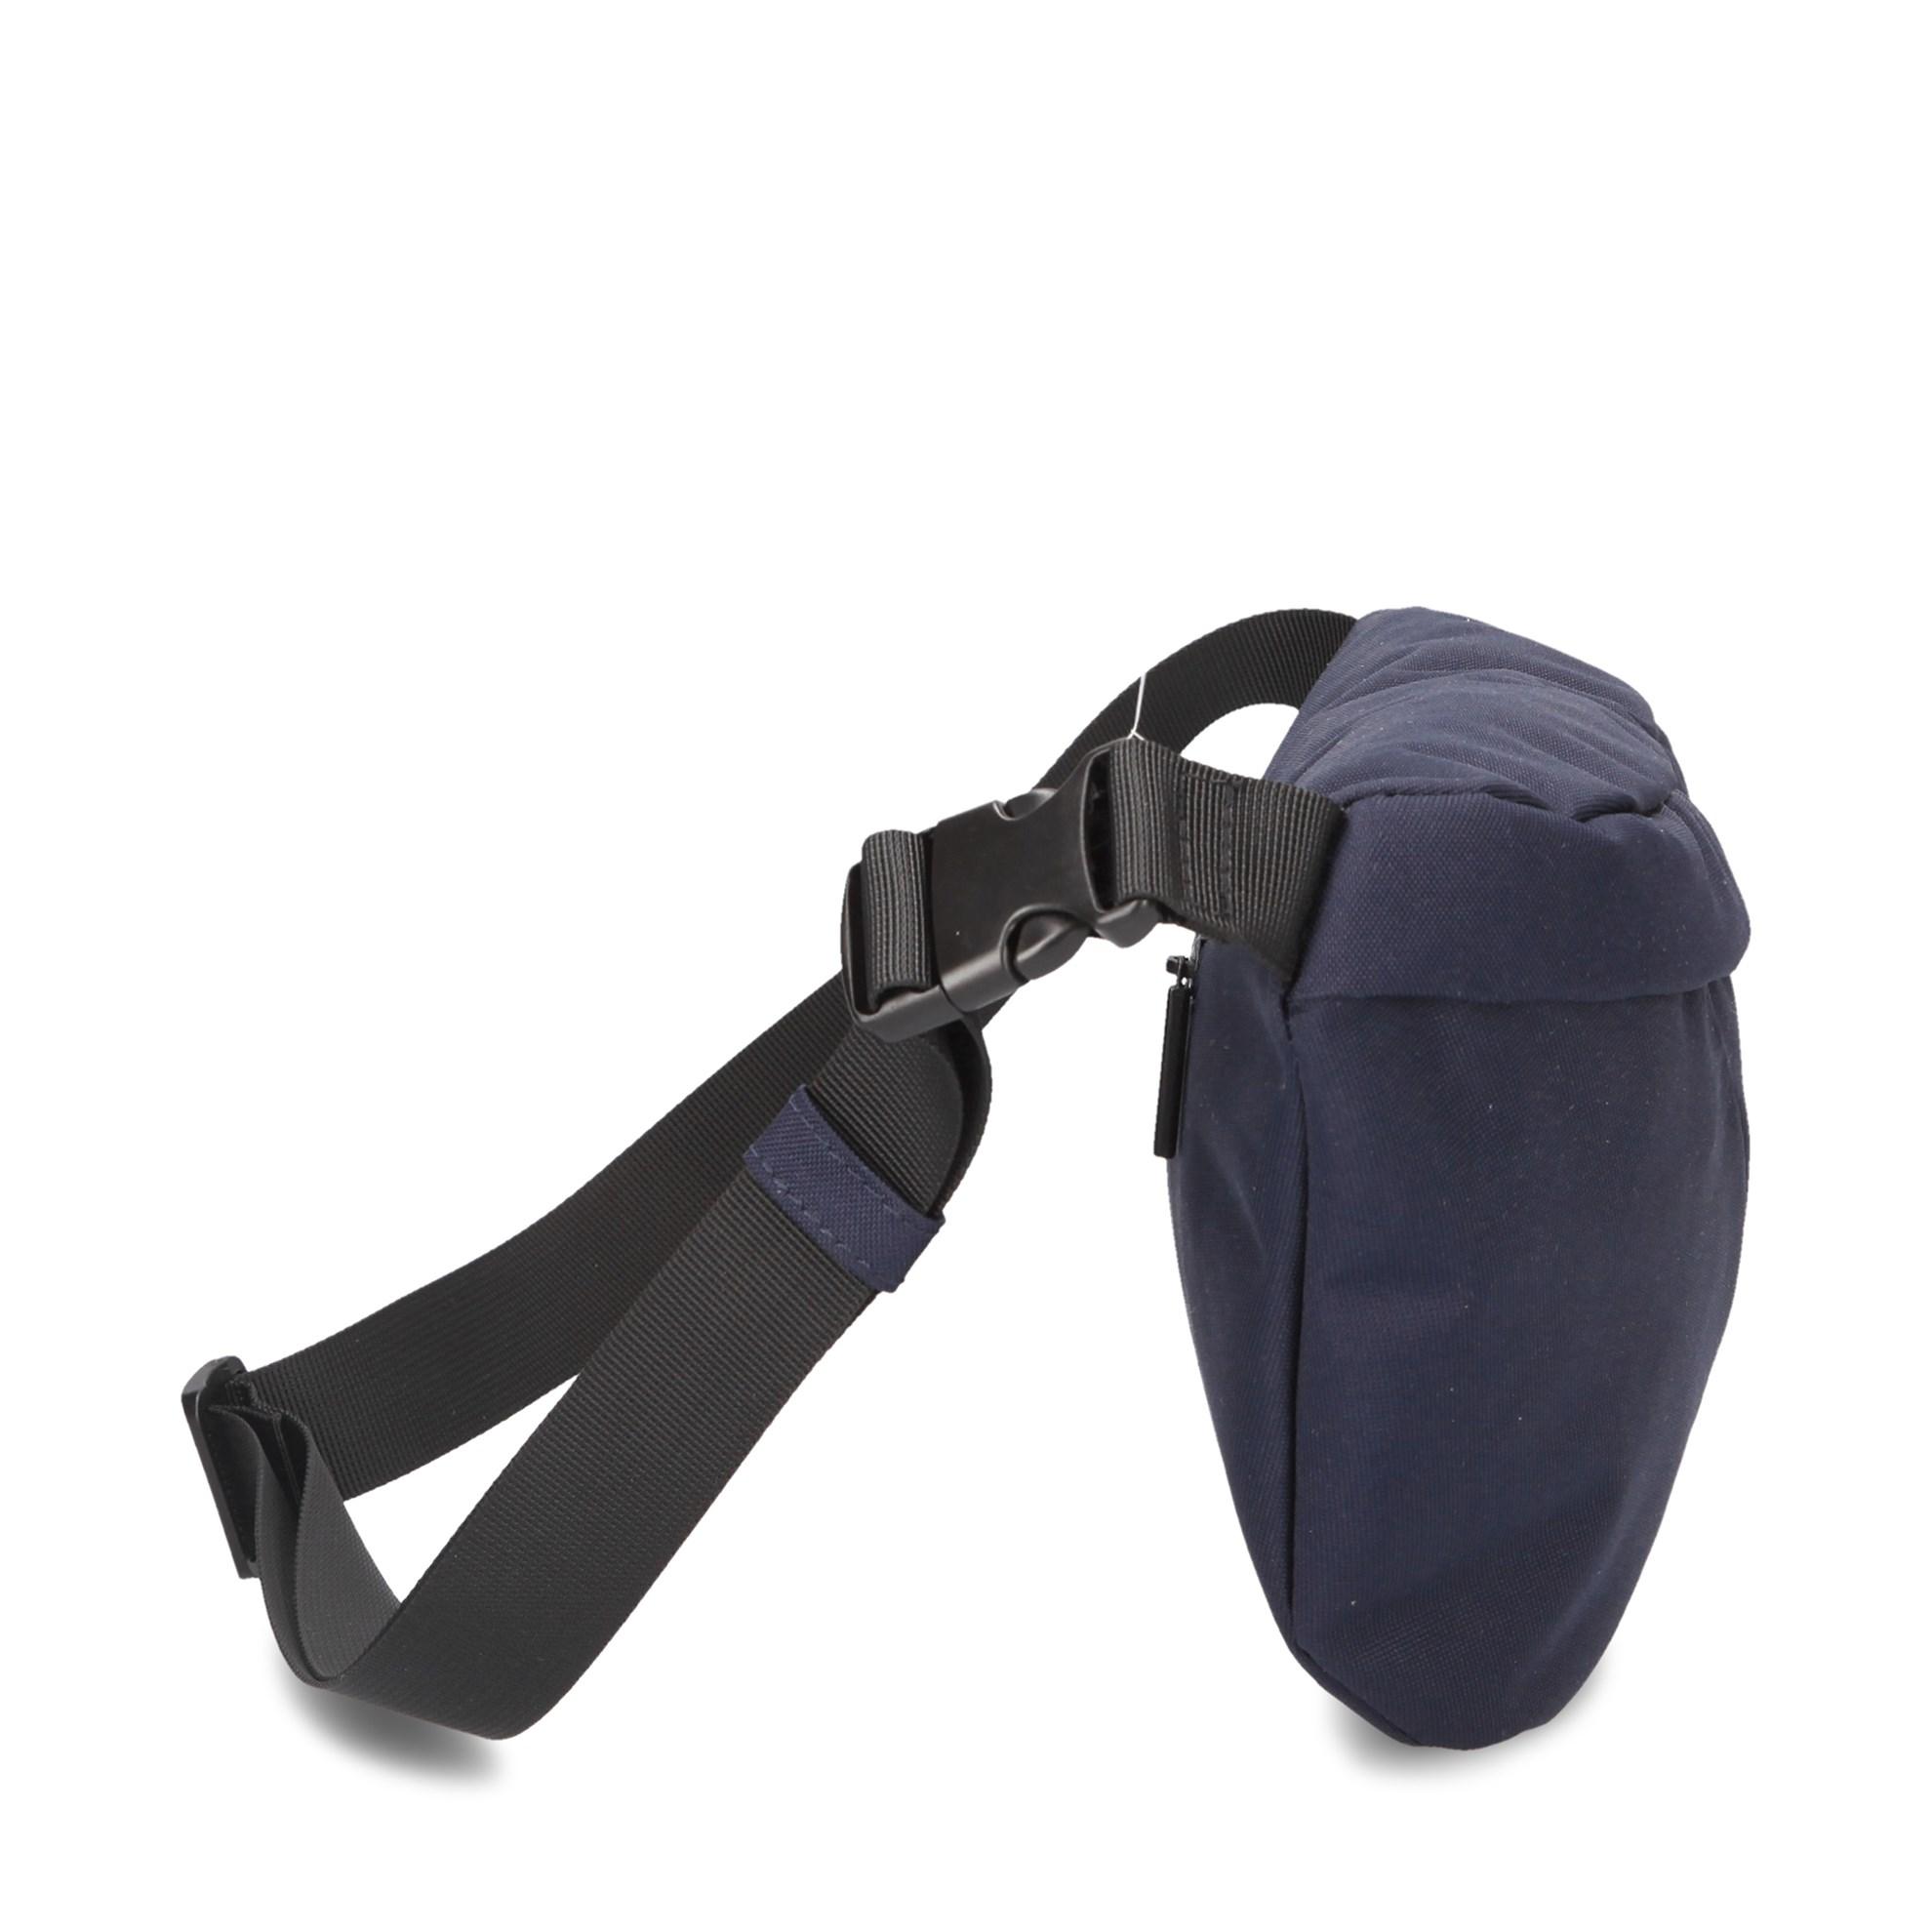 Taška přes rameno / Crossbody ZWEI CUT CUH80_2